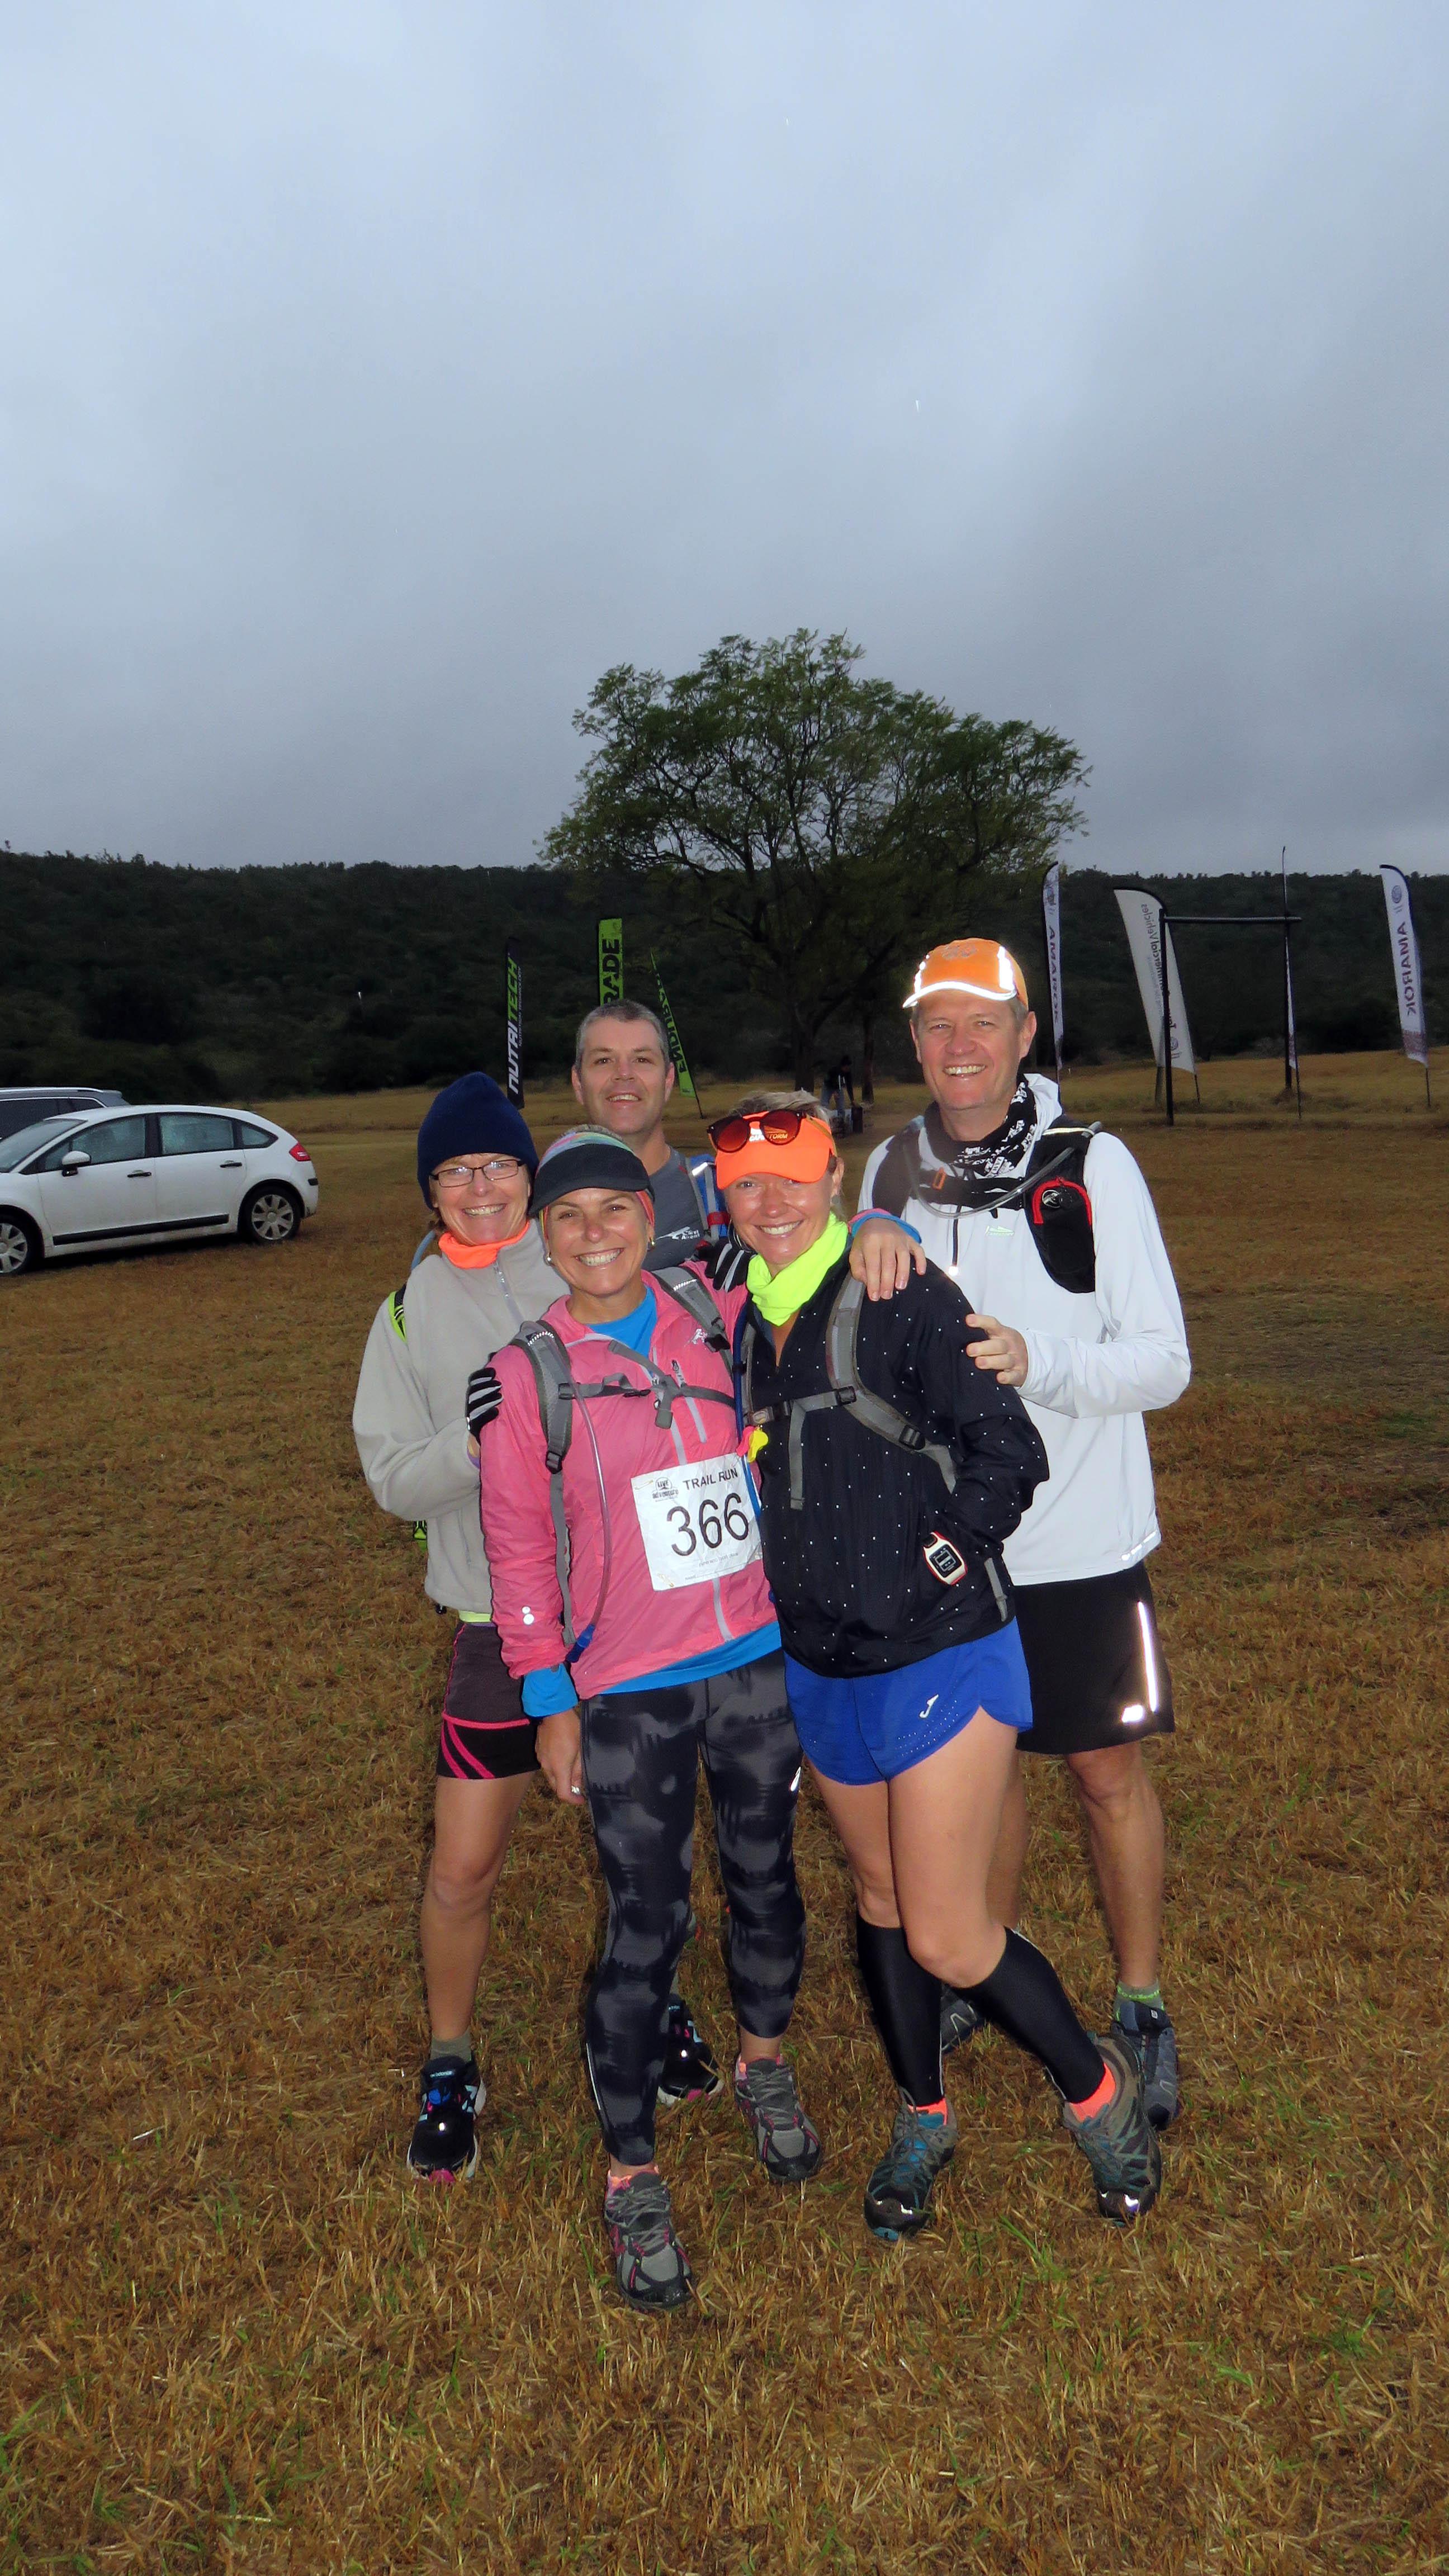 hayterdale trailrun 2018-08-05  (10)